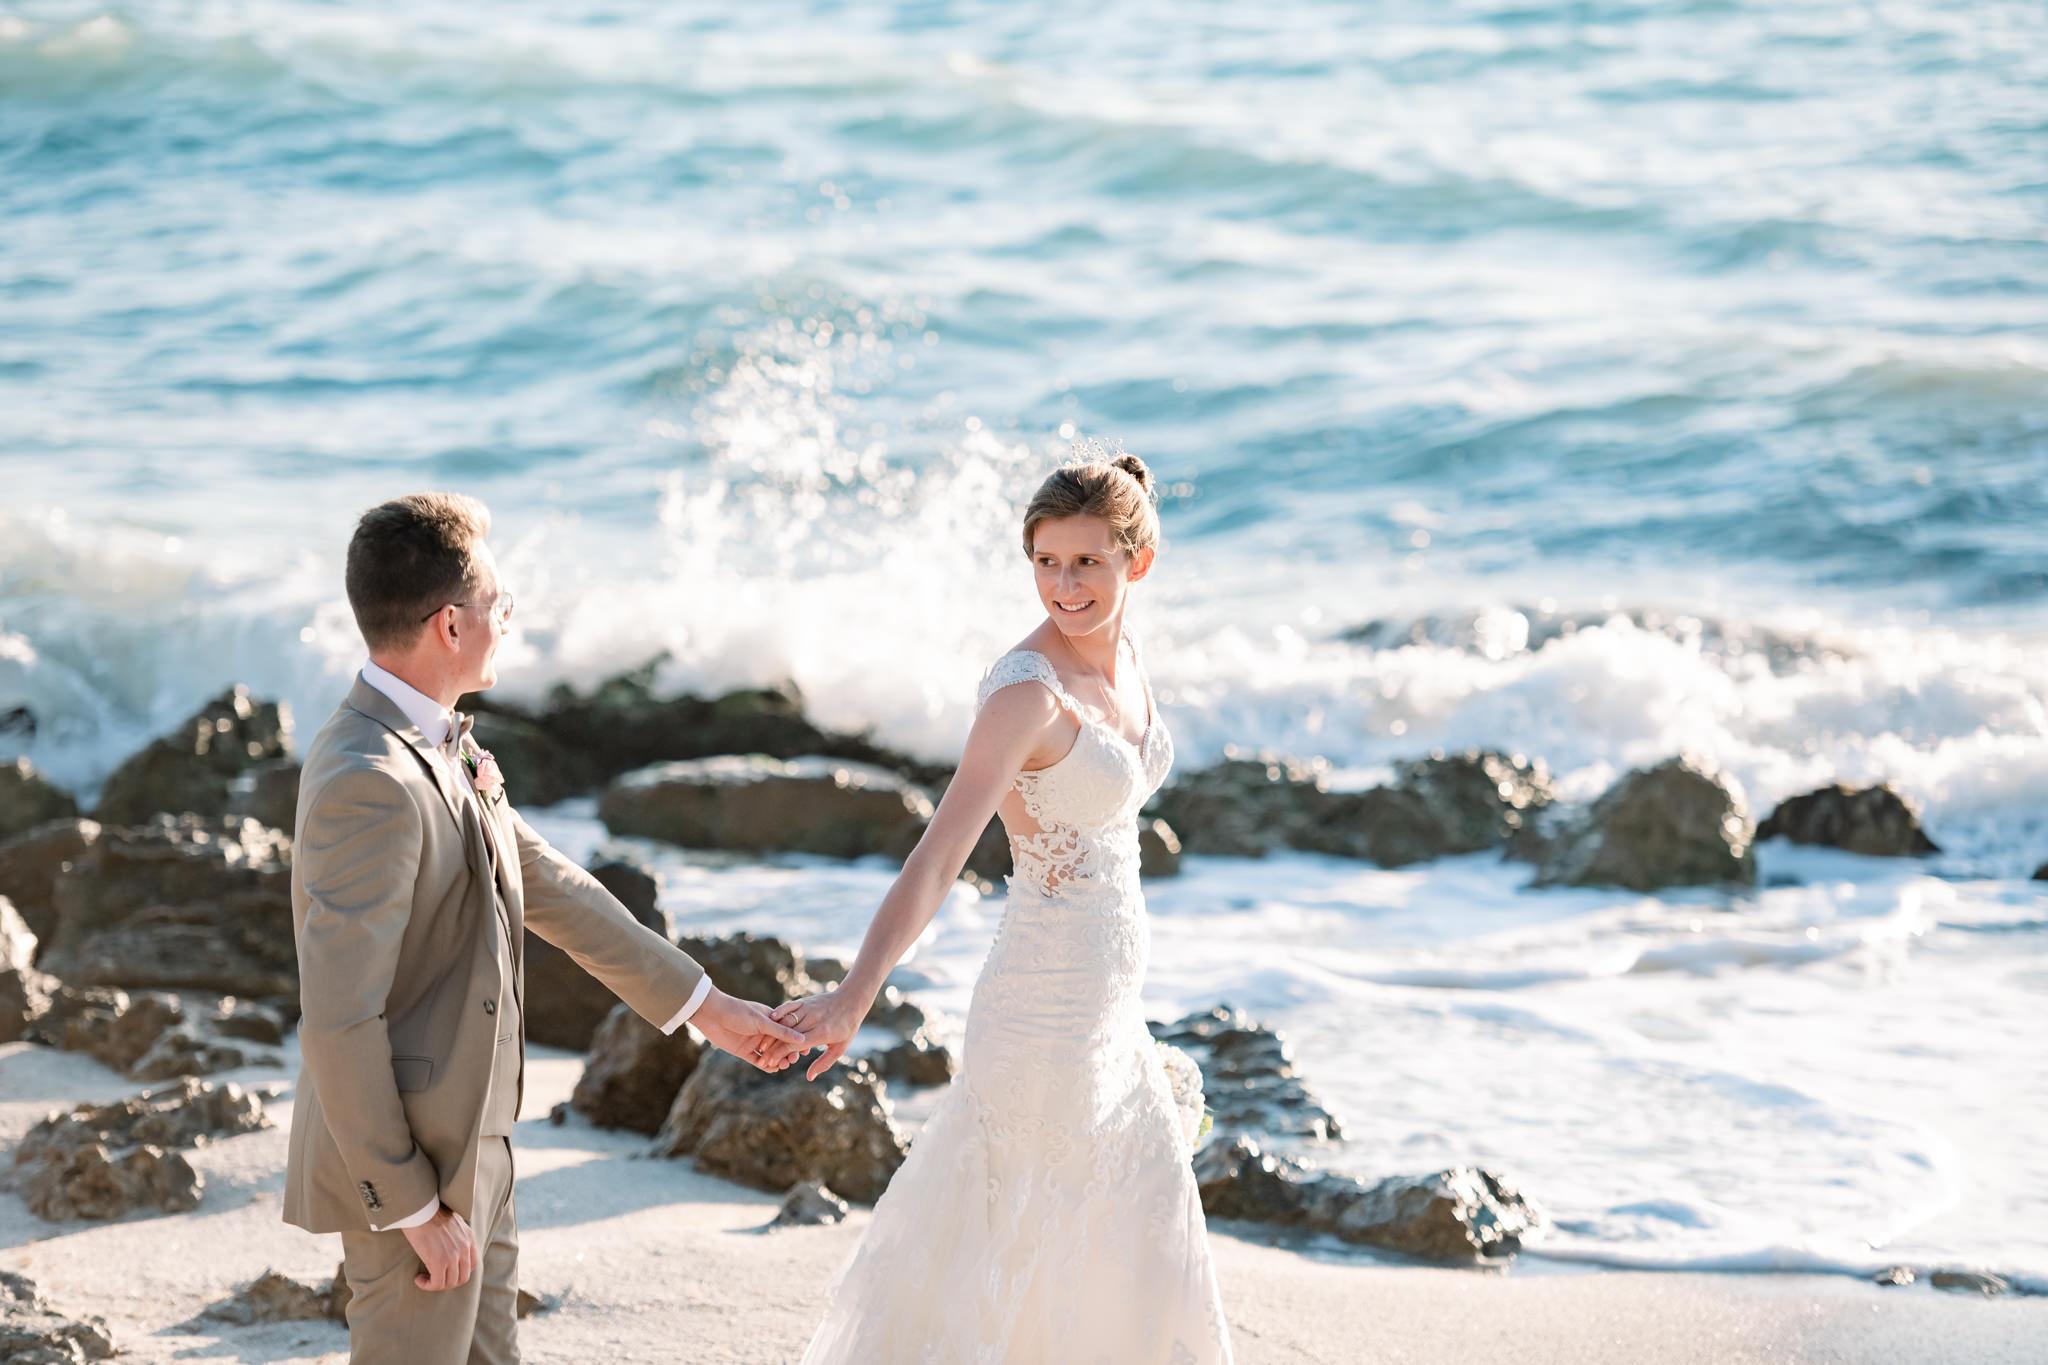 SARASOTA_WEDDING_PHOTOGRAPHY_SMMZ_7996.jpg